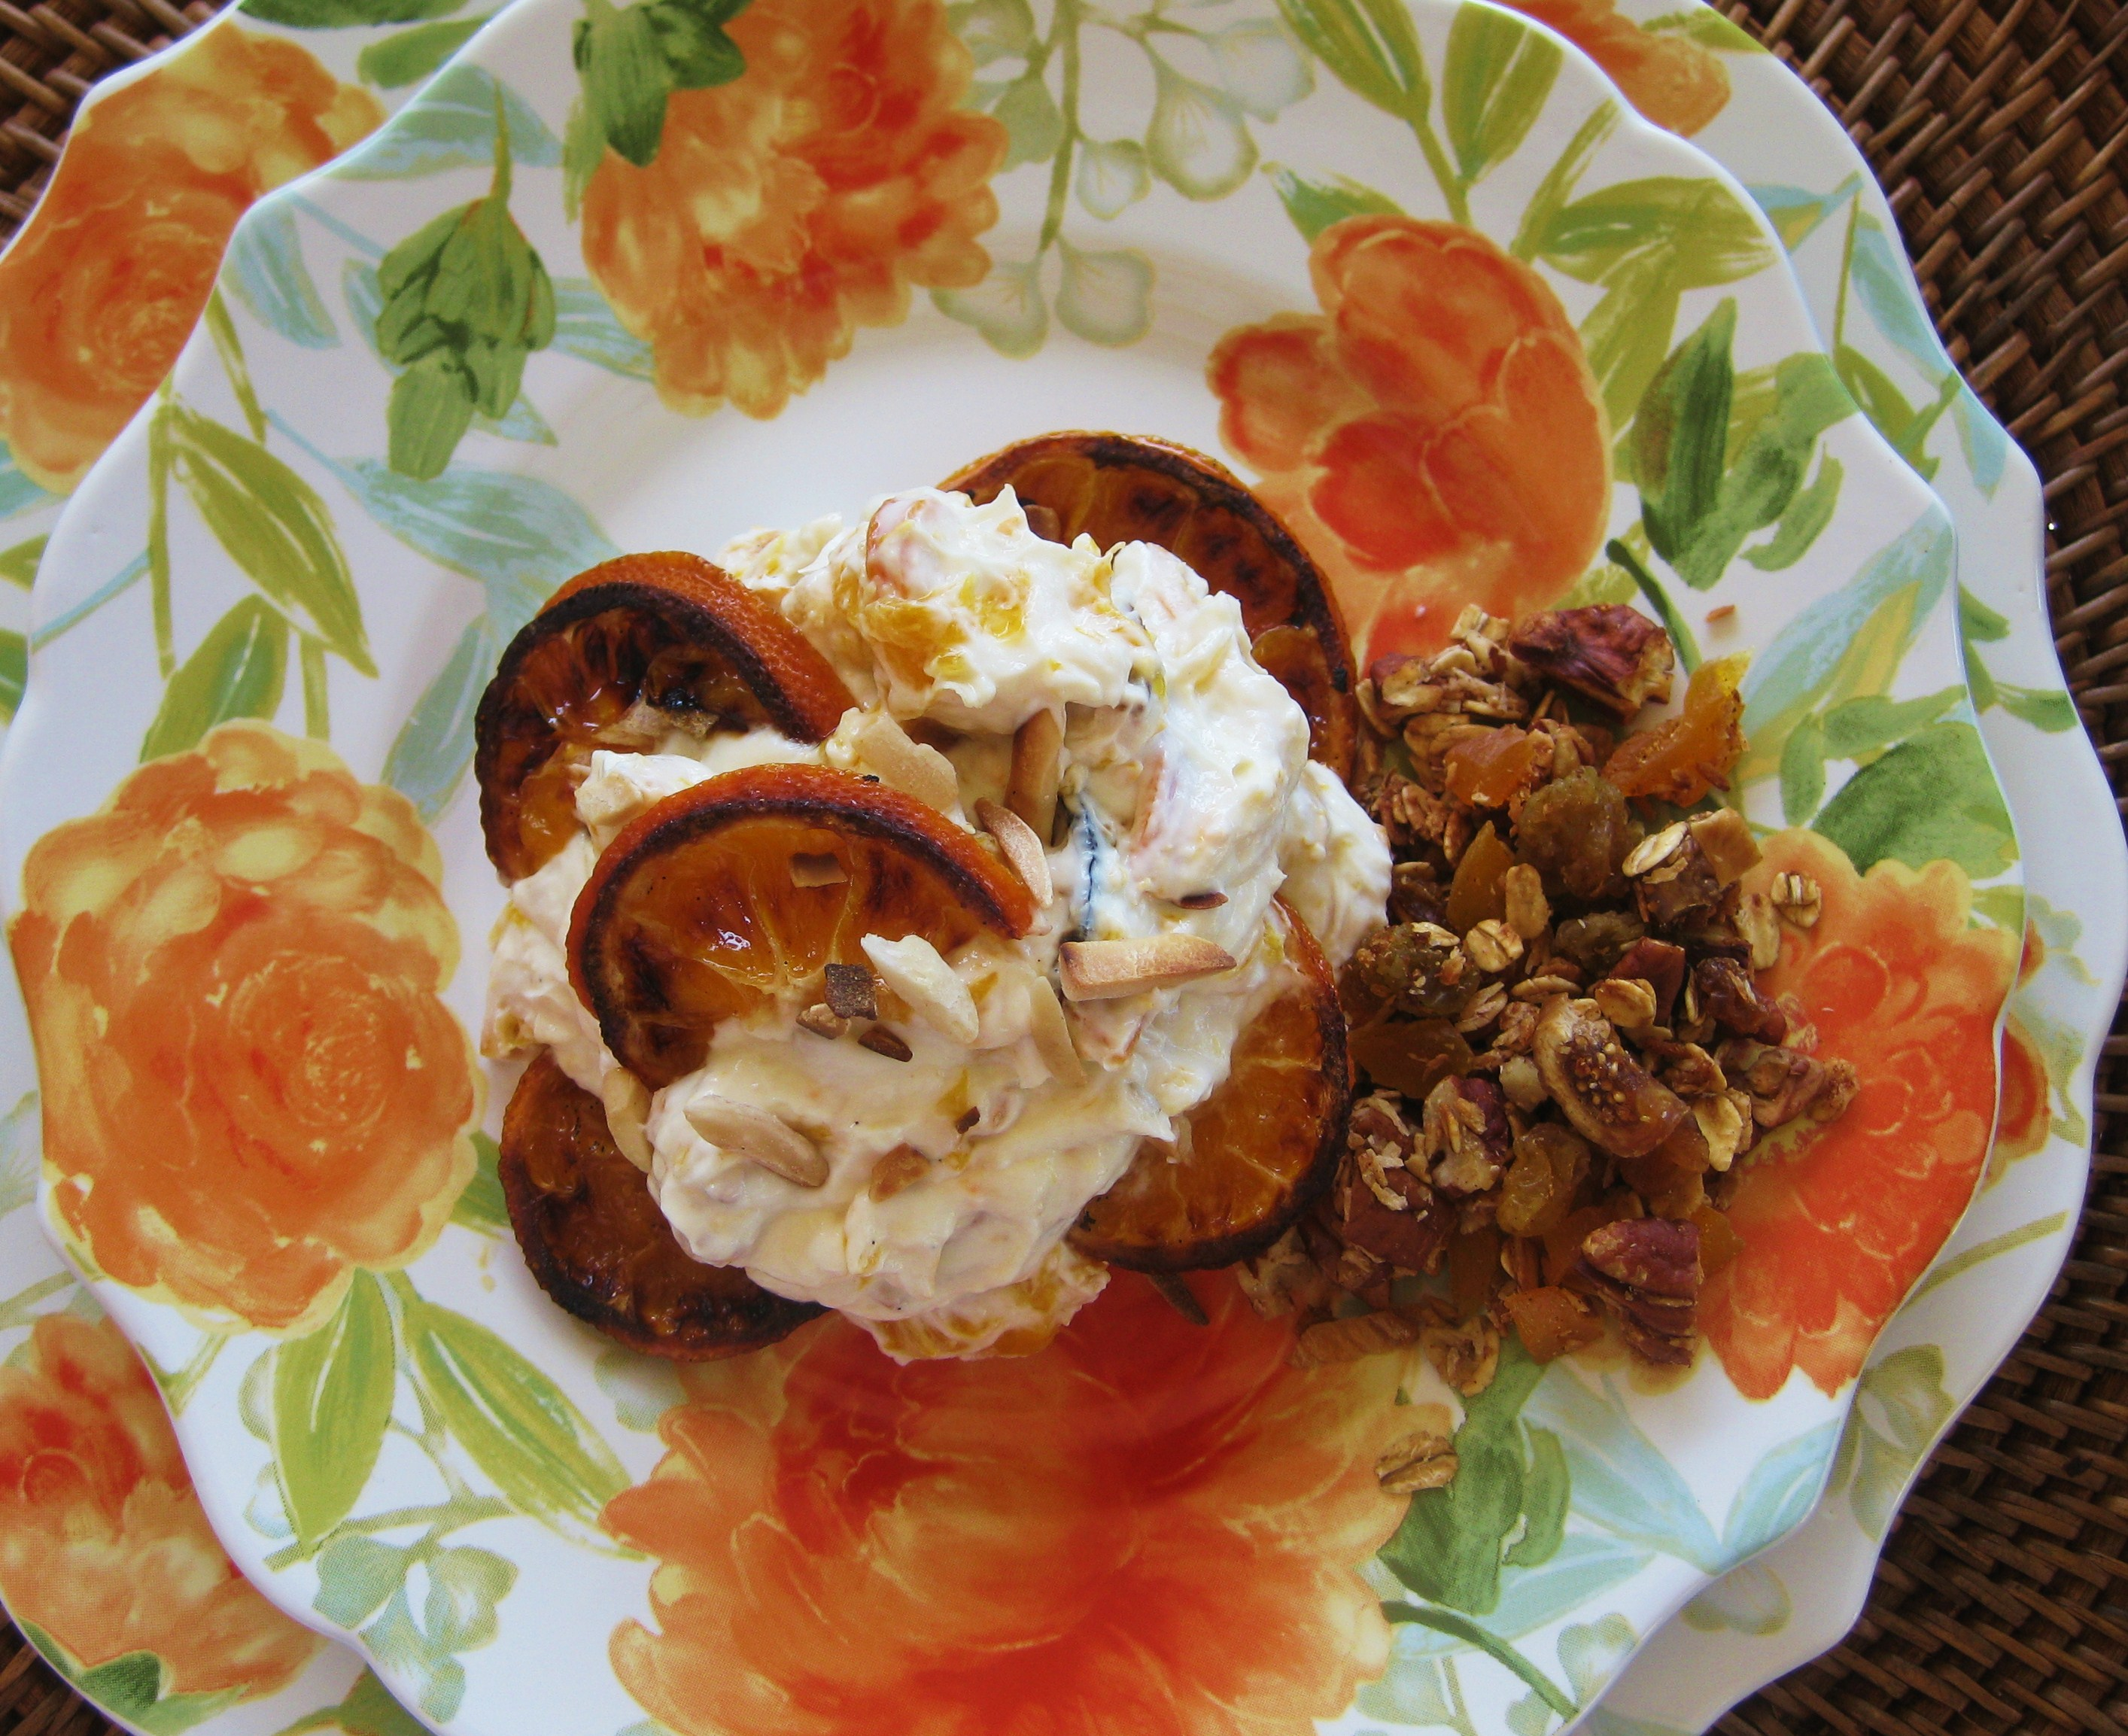 Citruslove: Caramelized Orange Yogurt Savoring Every Bite